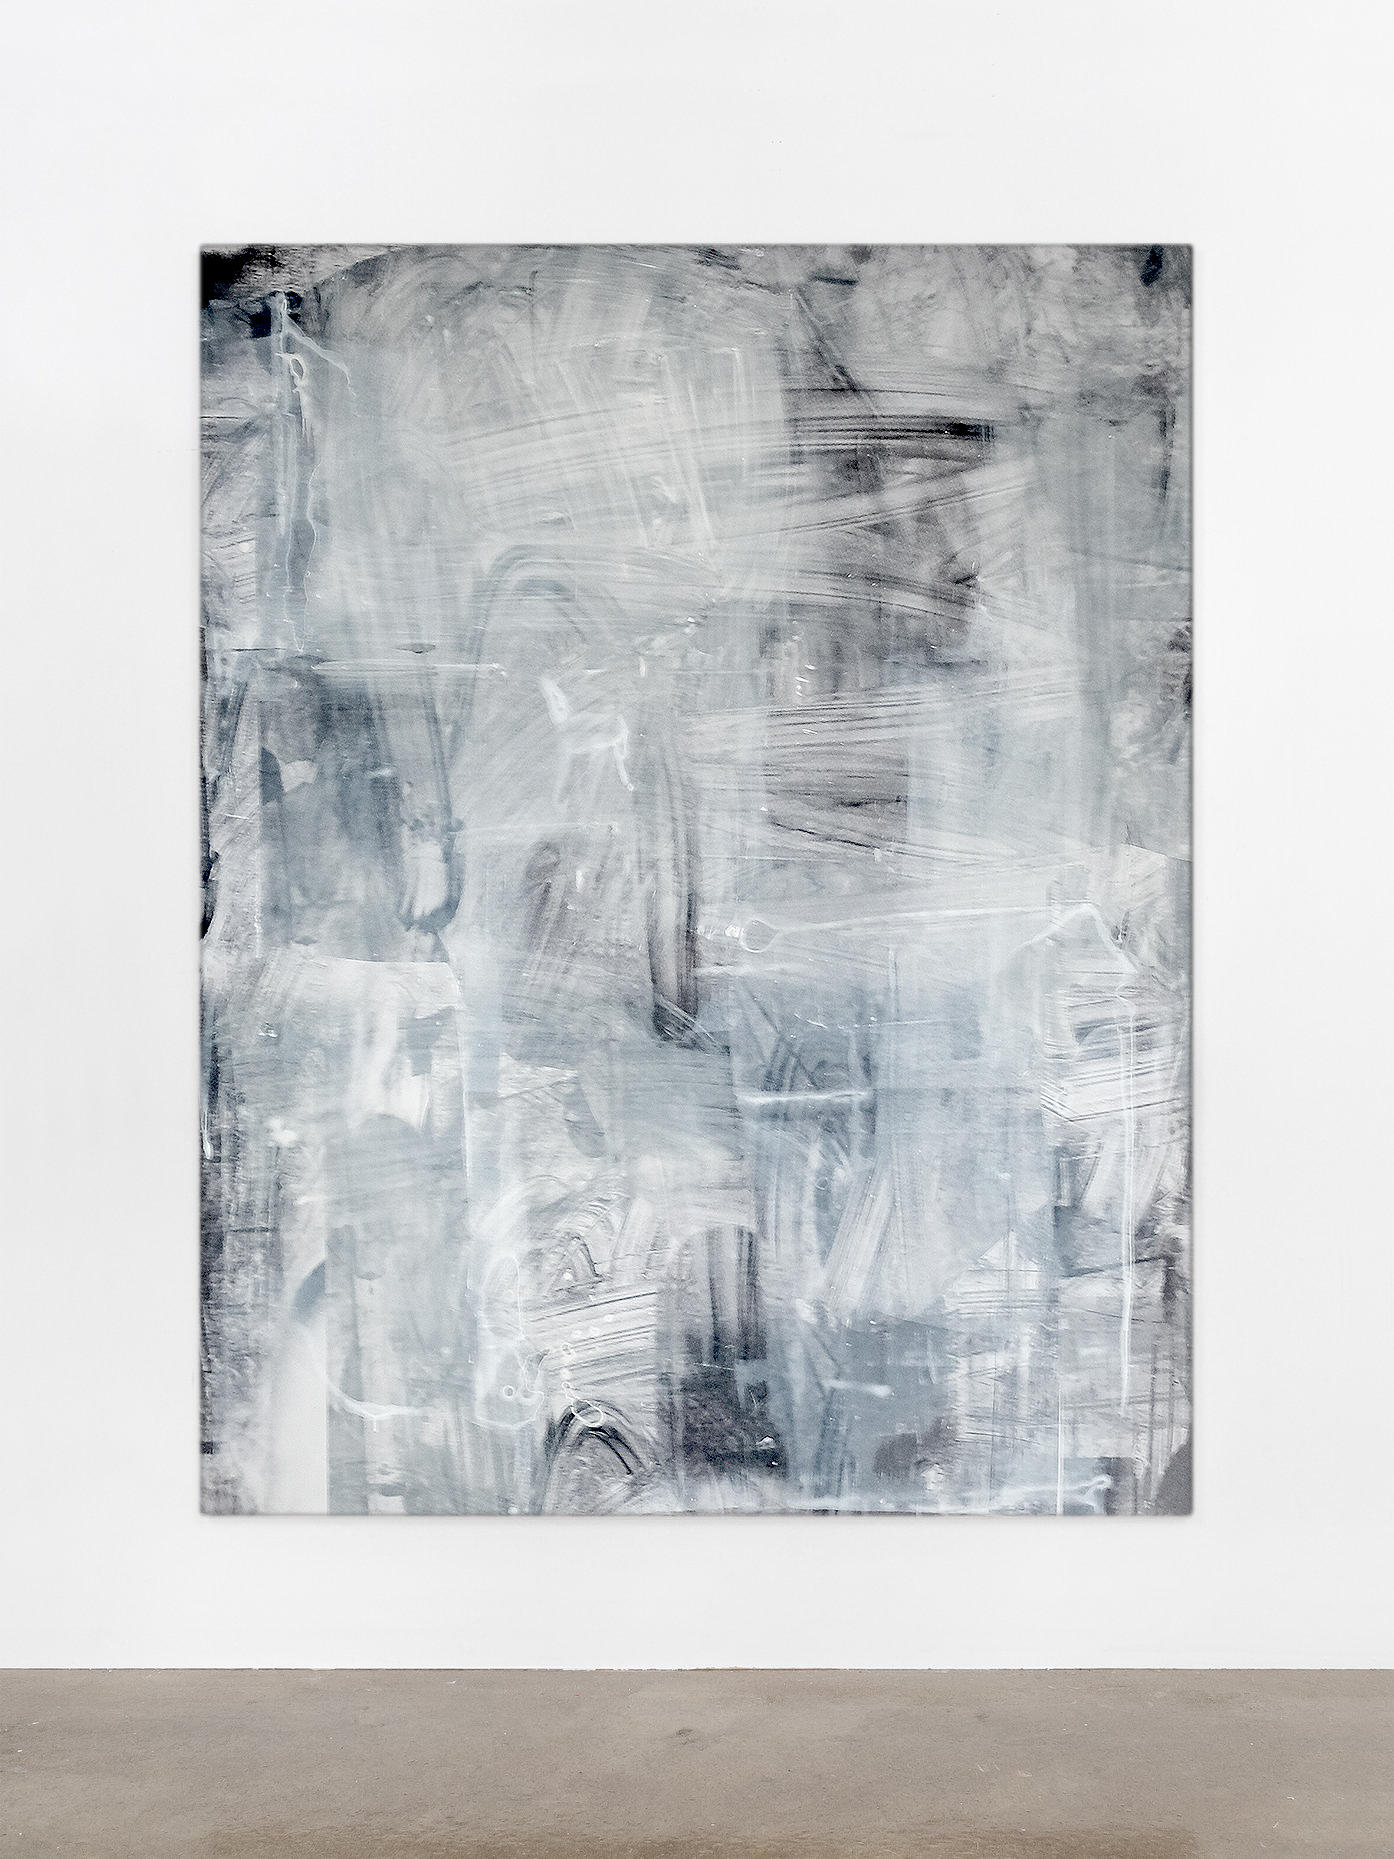 Reuben Beren James, Artwork, The praise of hicks